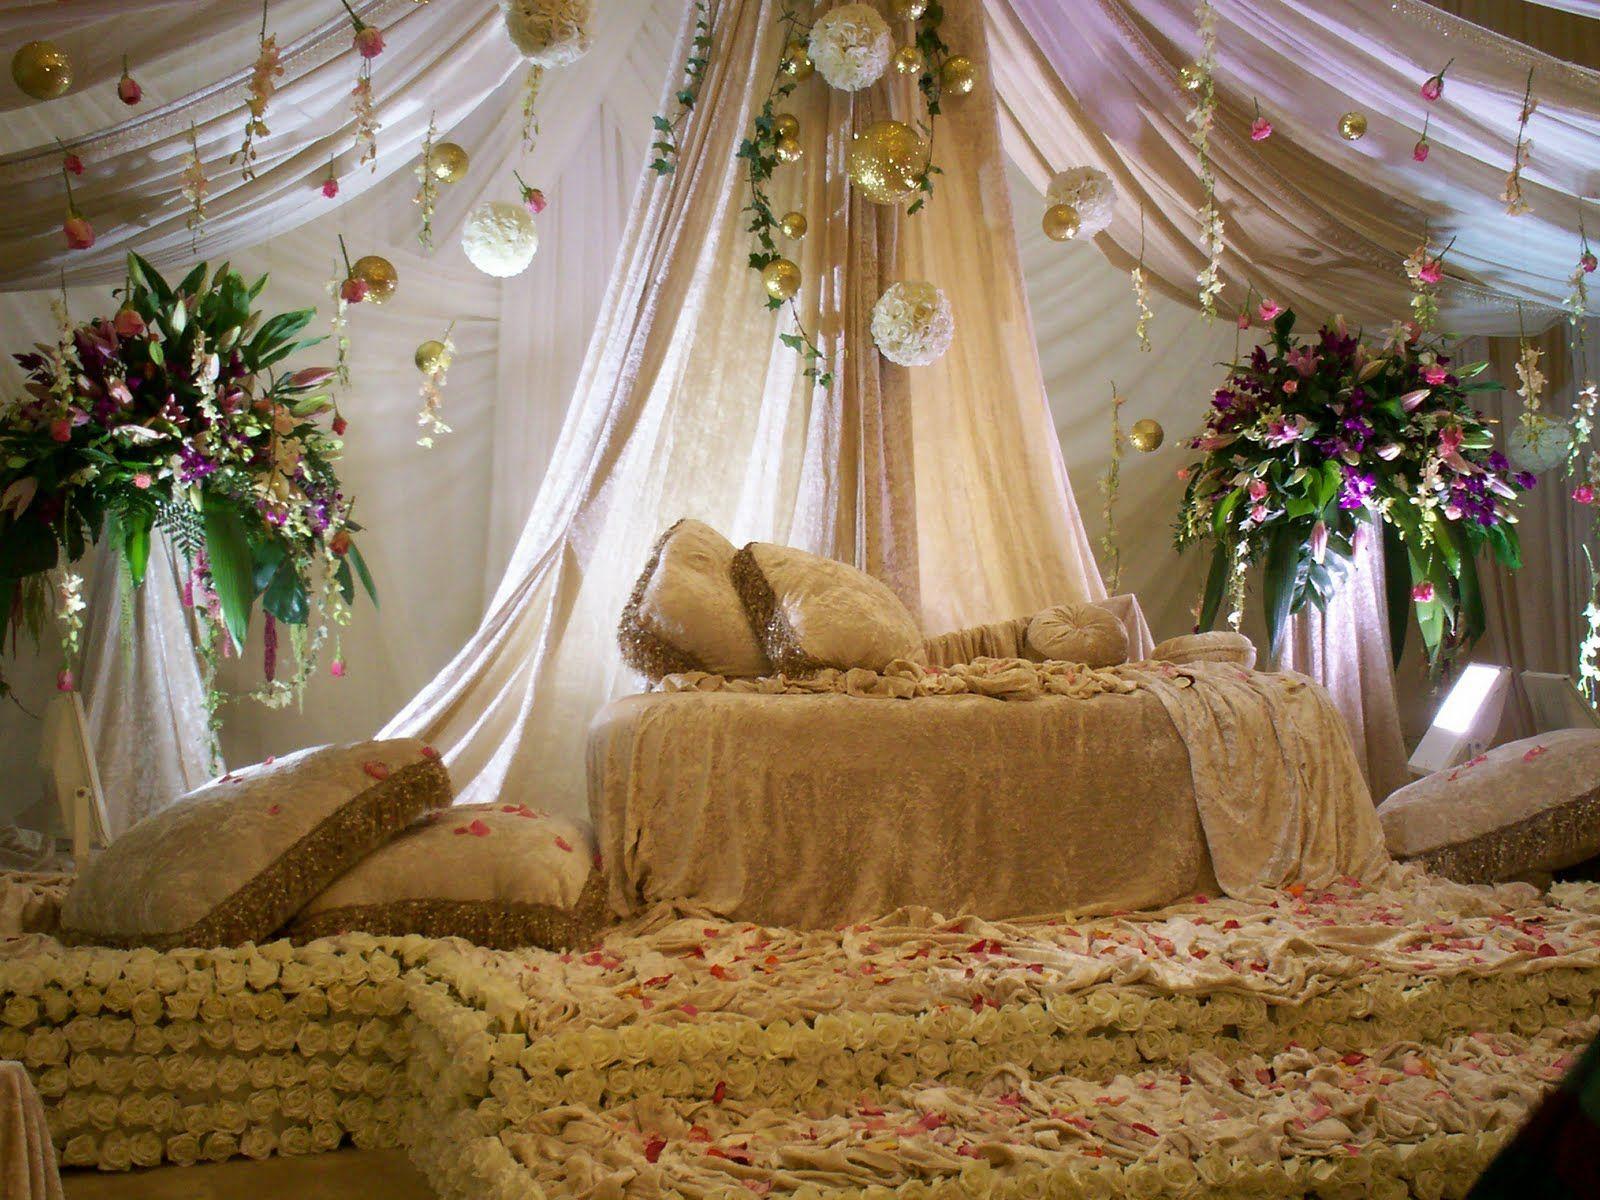 Arabic Wedding Stage Wedding Room Decorations Fun Wedding Decor Beautiful Wedding Decorations